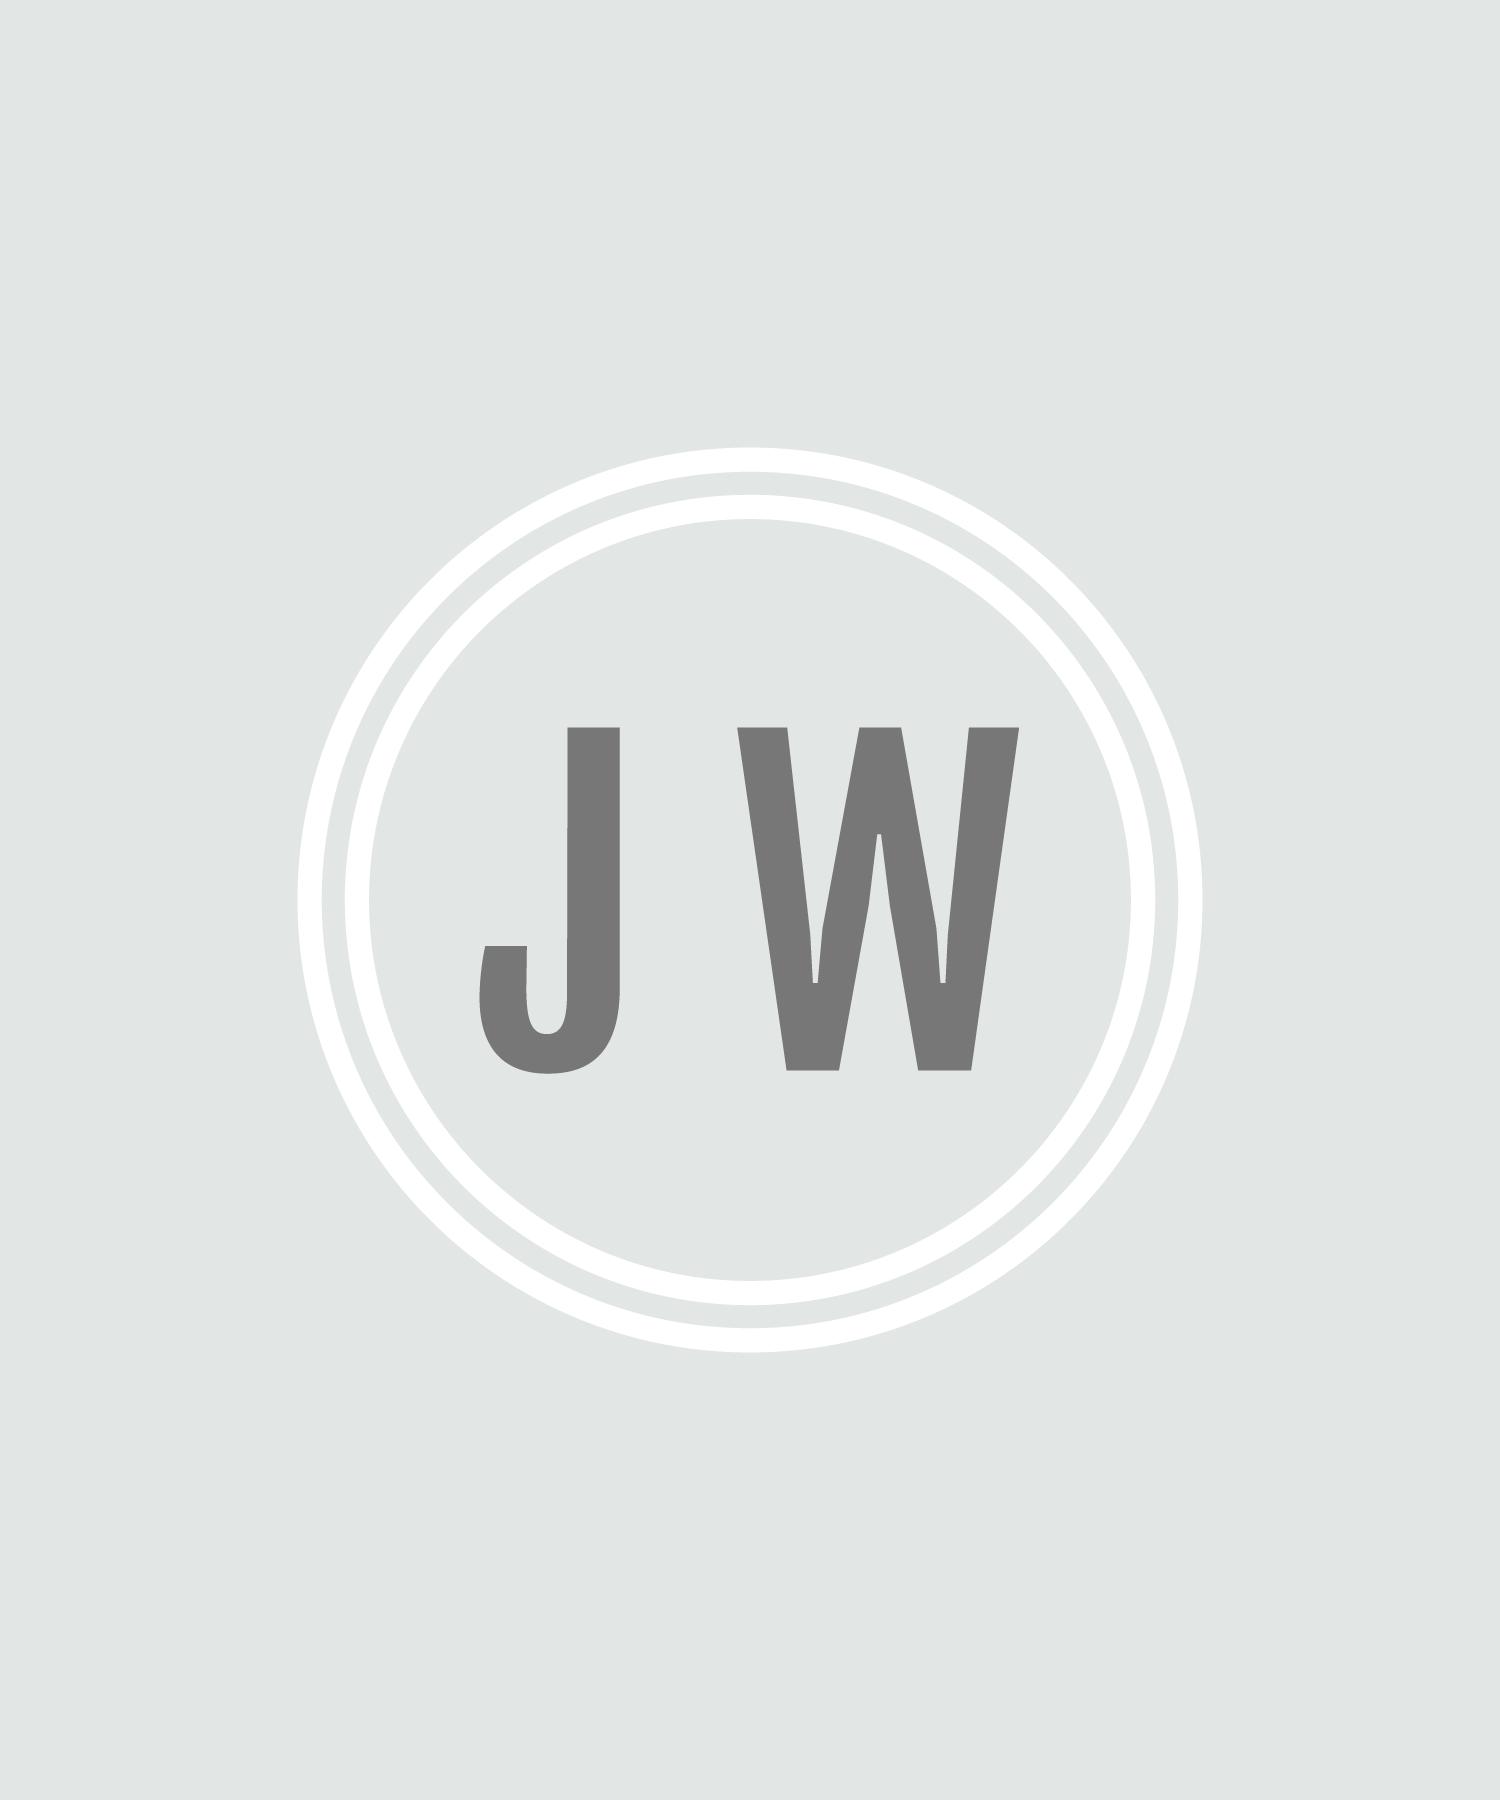 Jamie Webb Assistant Editor Logo & Branding by Bea & Bloom Creative Design Studio